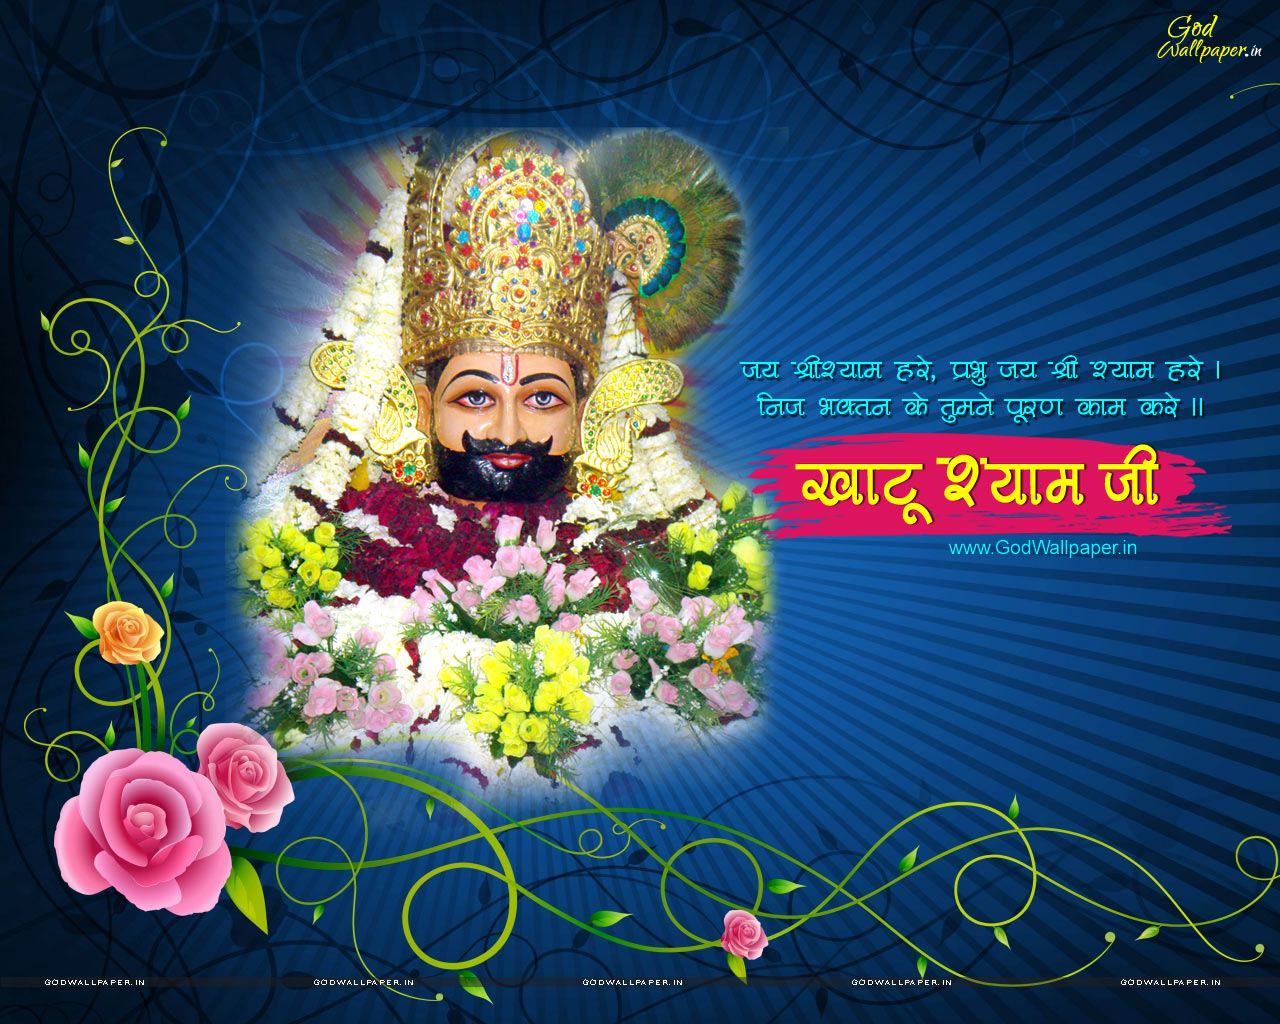 Khatu Shyam Wallpapers Photos Images Galleries